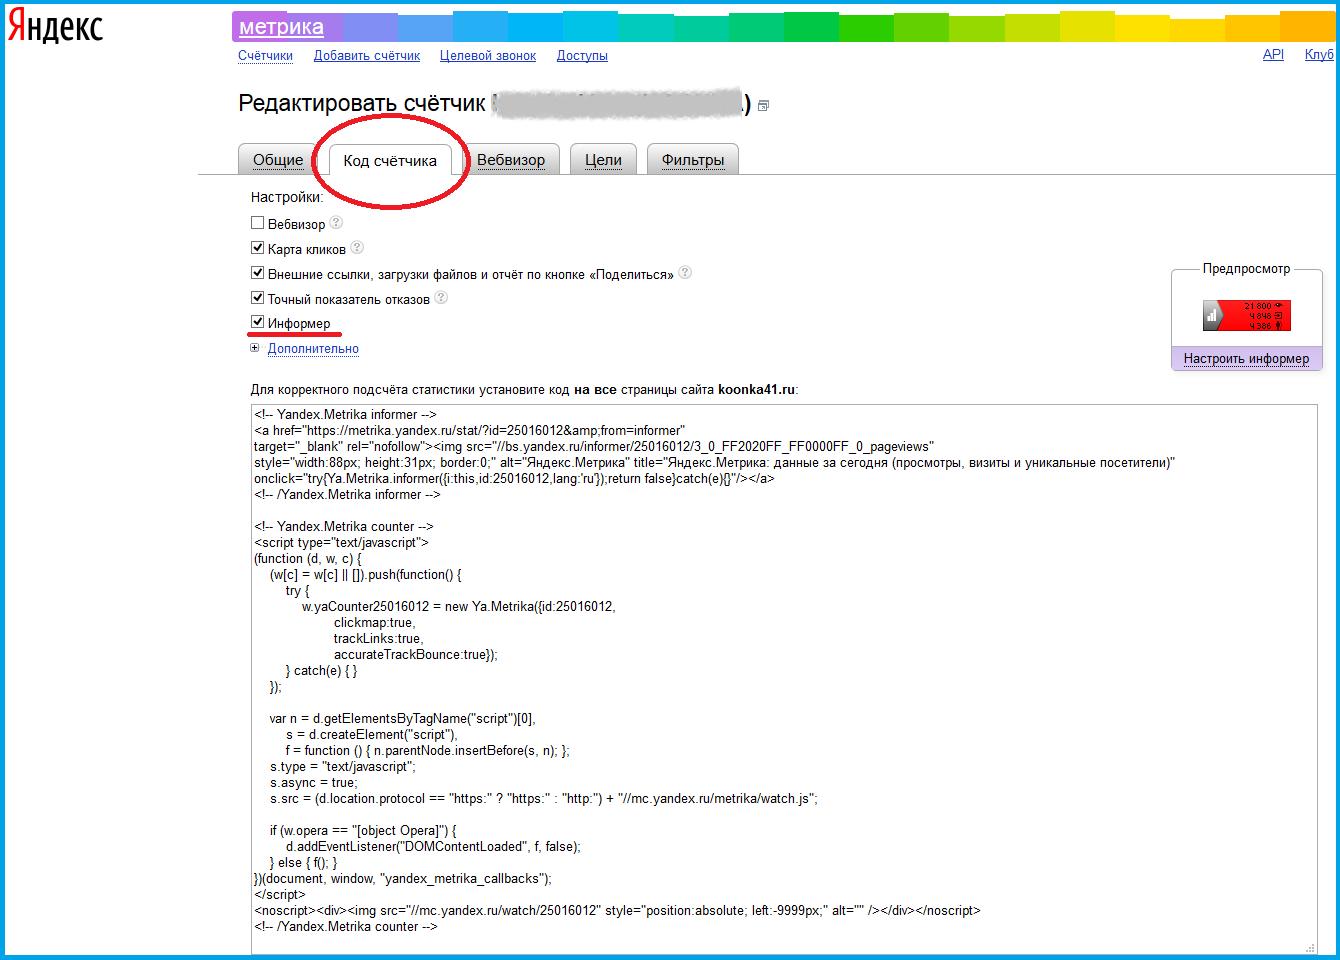 Информер кода счетчика для интернет-магазина на Eshoper.ru